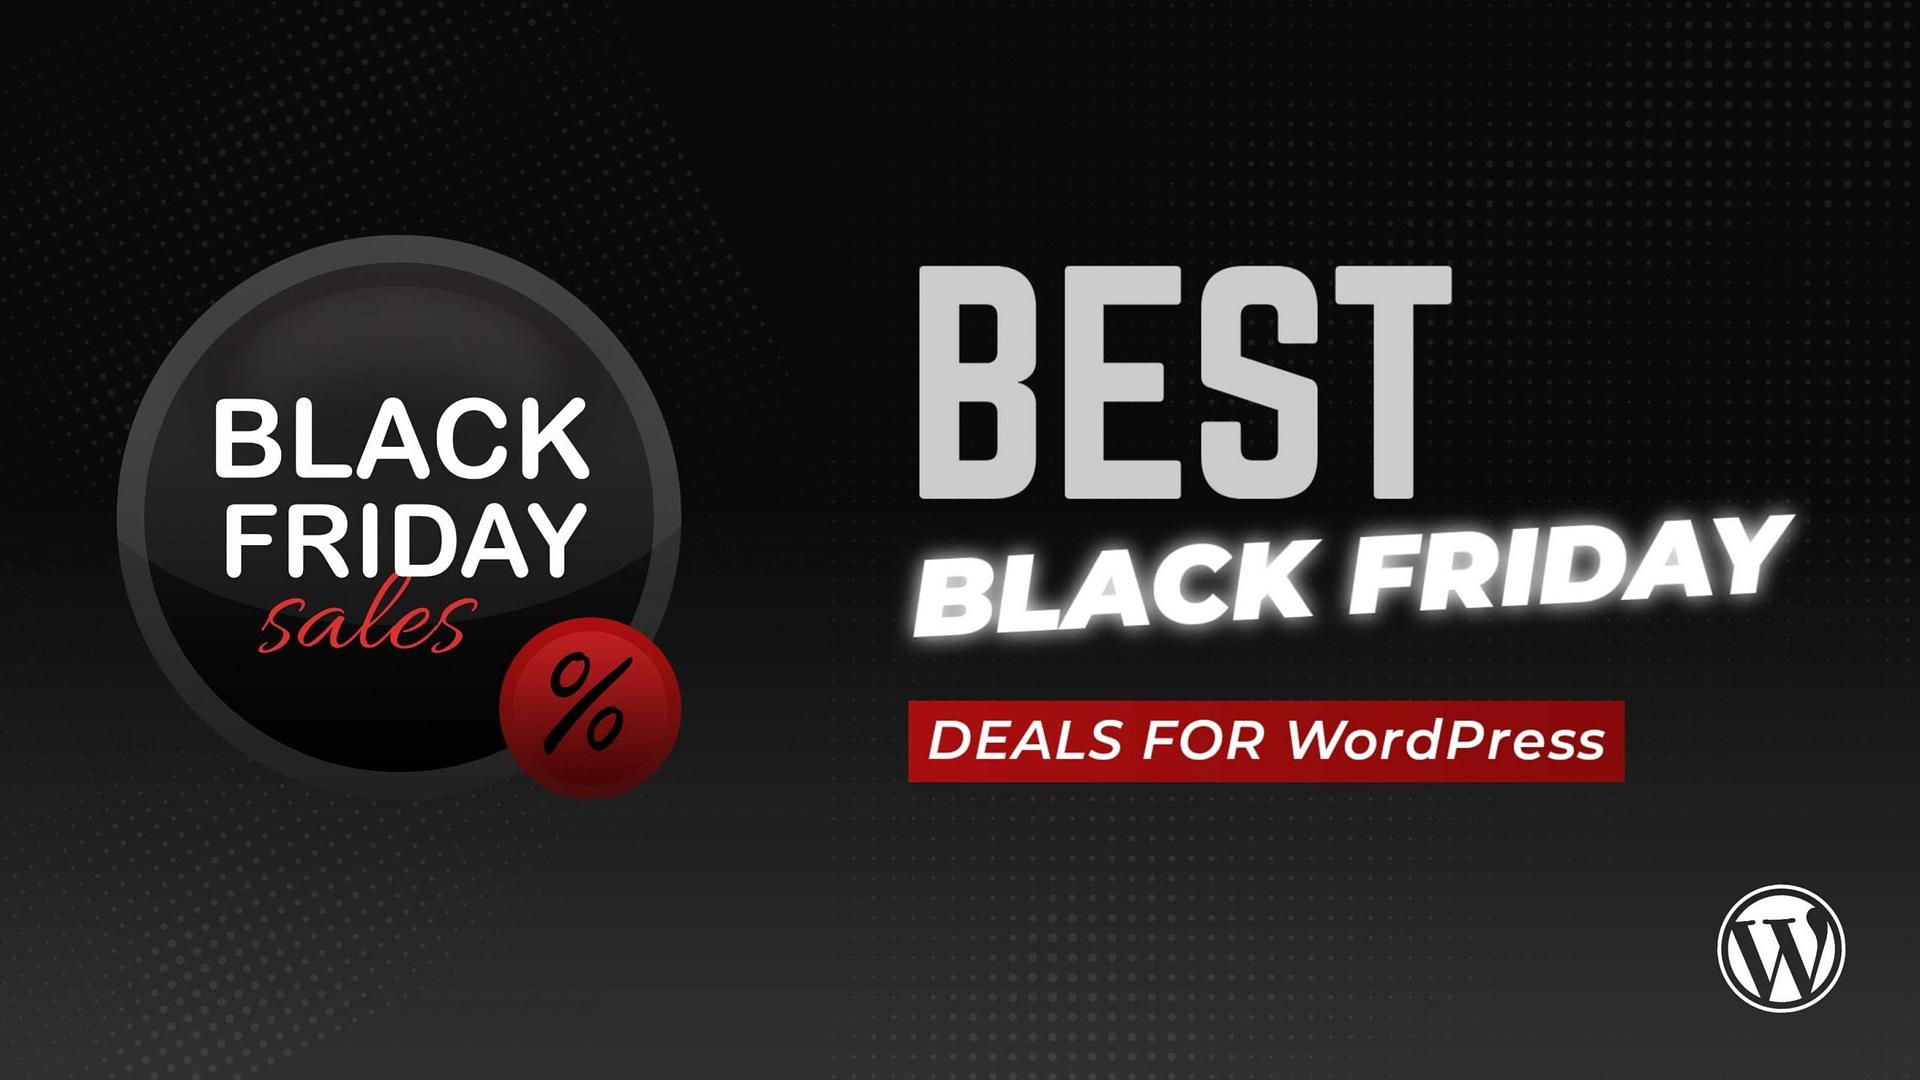 Best Black Friday Deals For WordPress